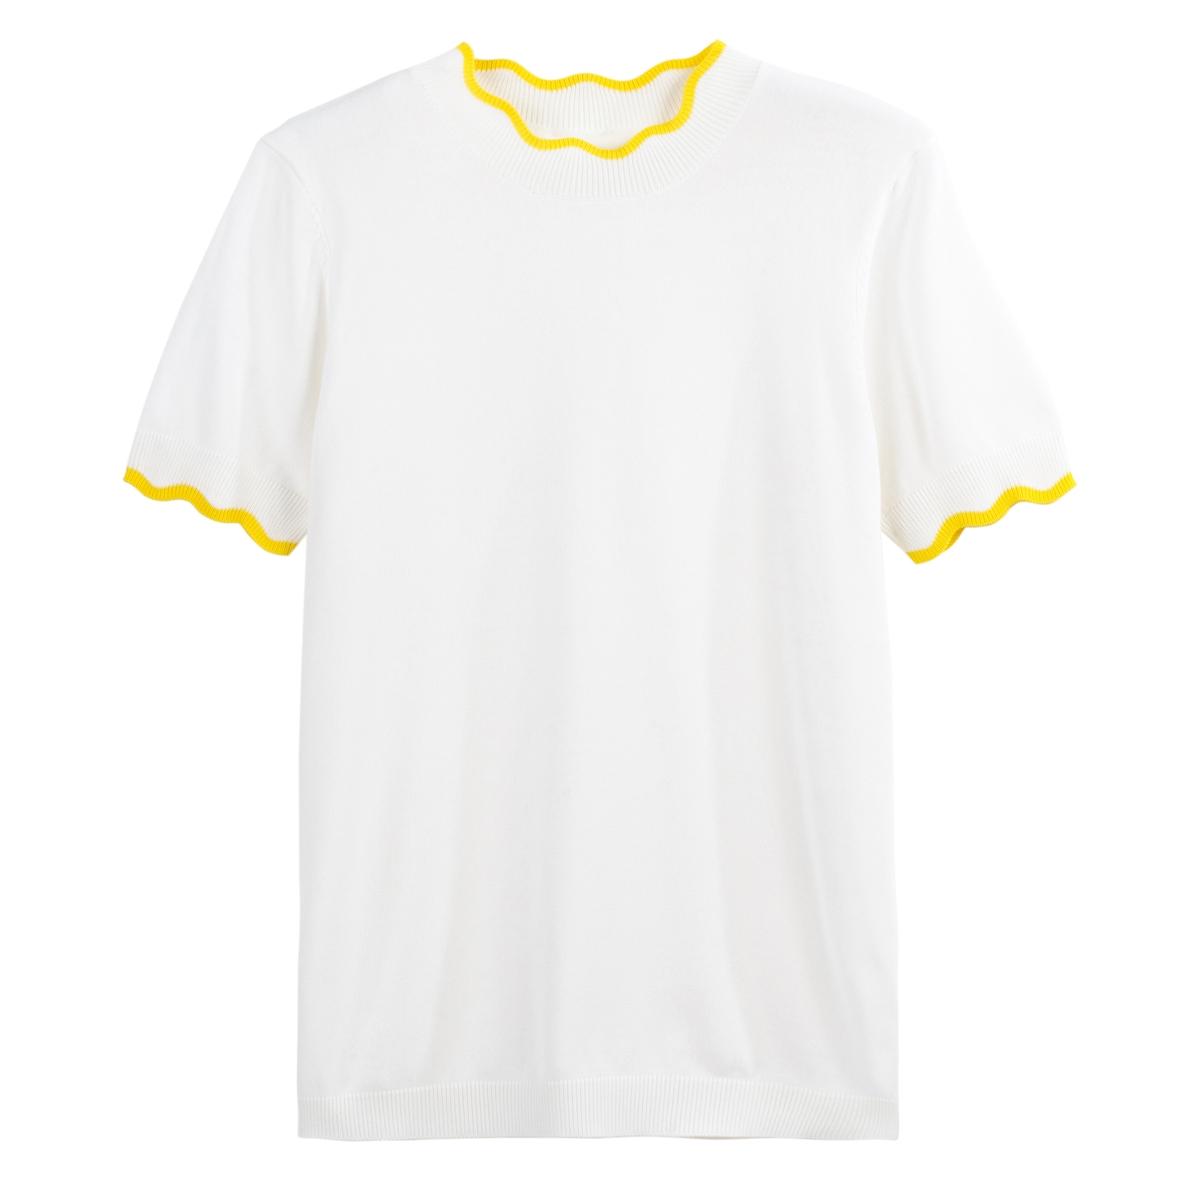 Jersey de manga corta bicolor